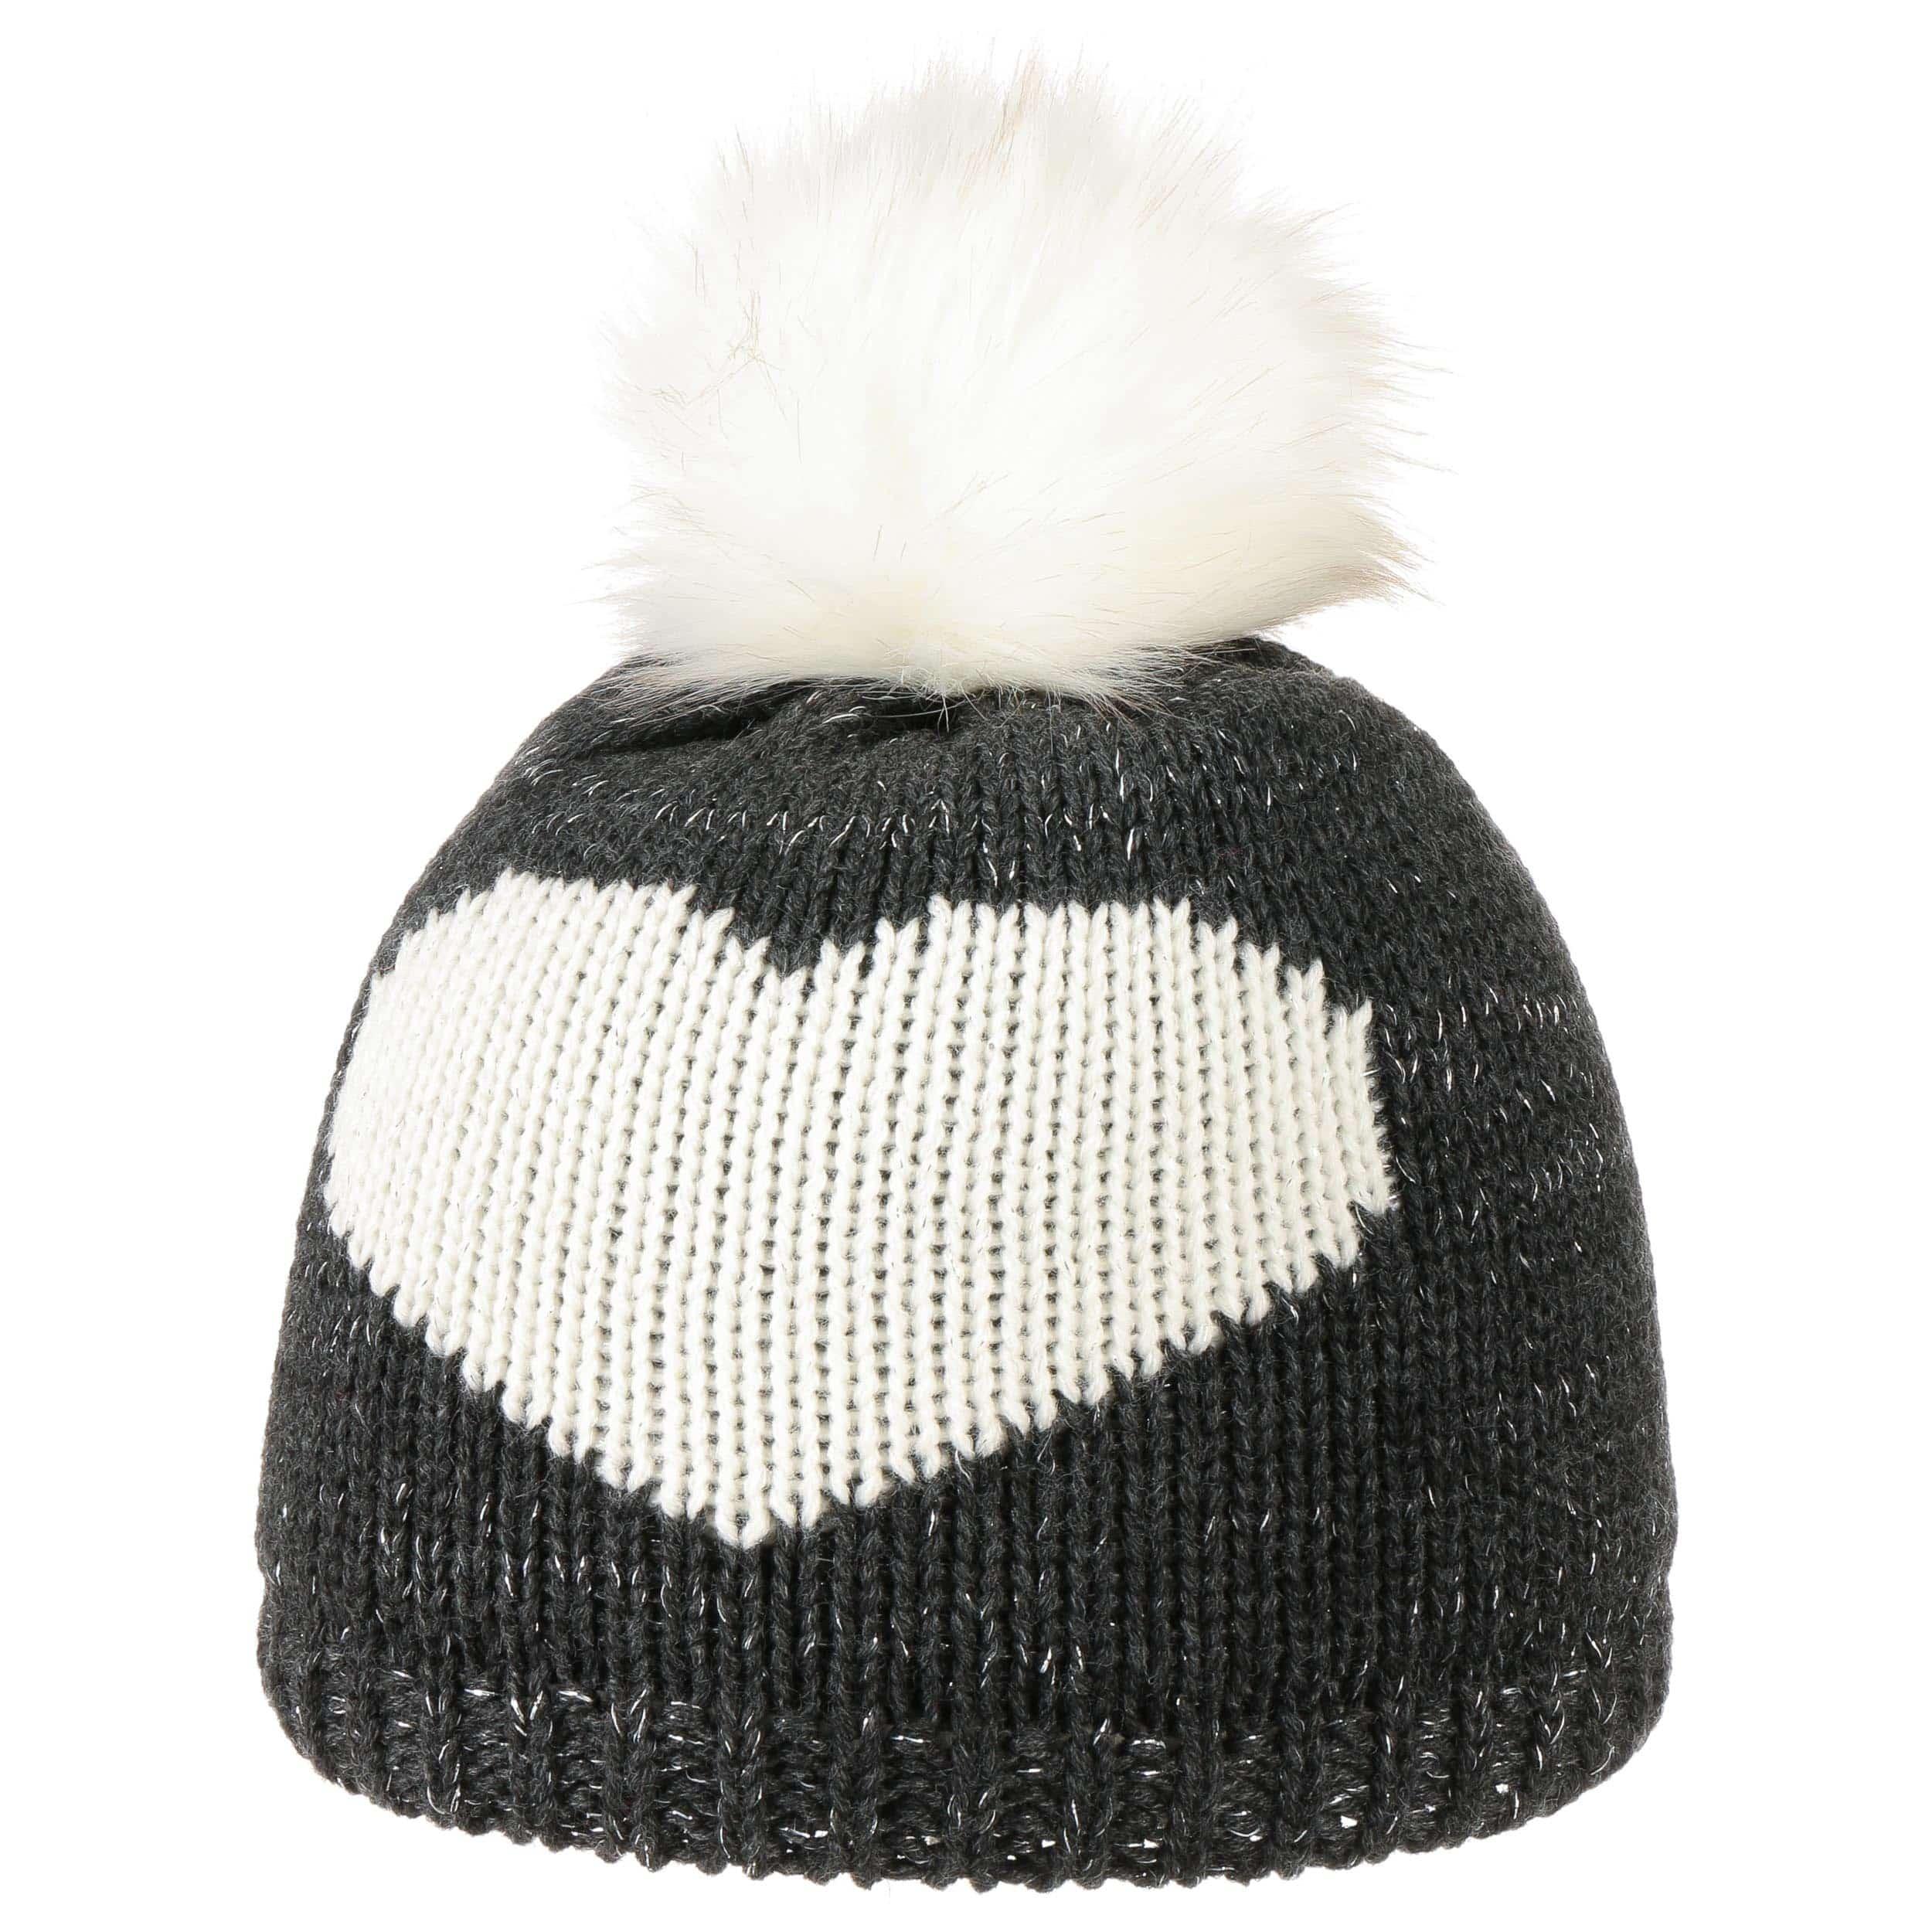 Lurex Girls Pompom Hat by maximo a08c5f40a1c6